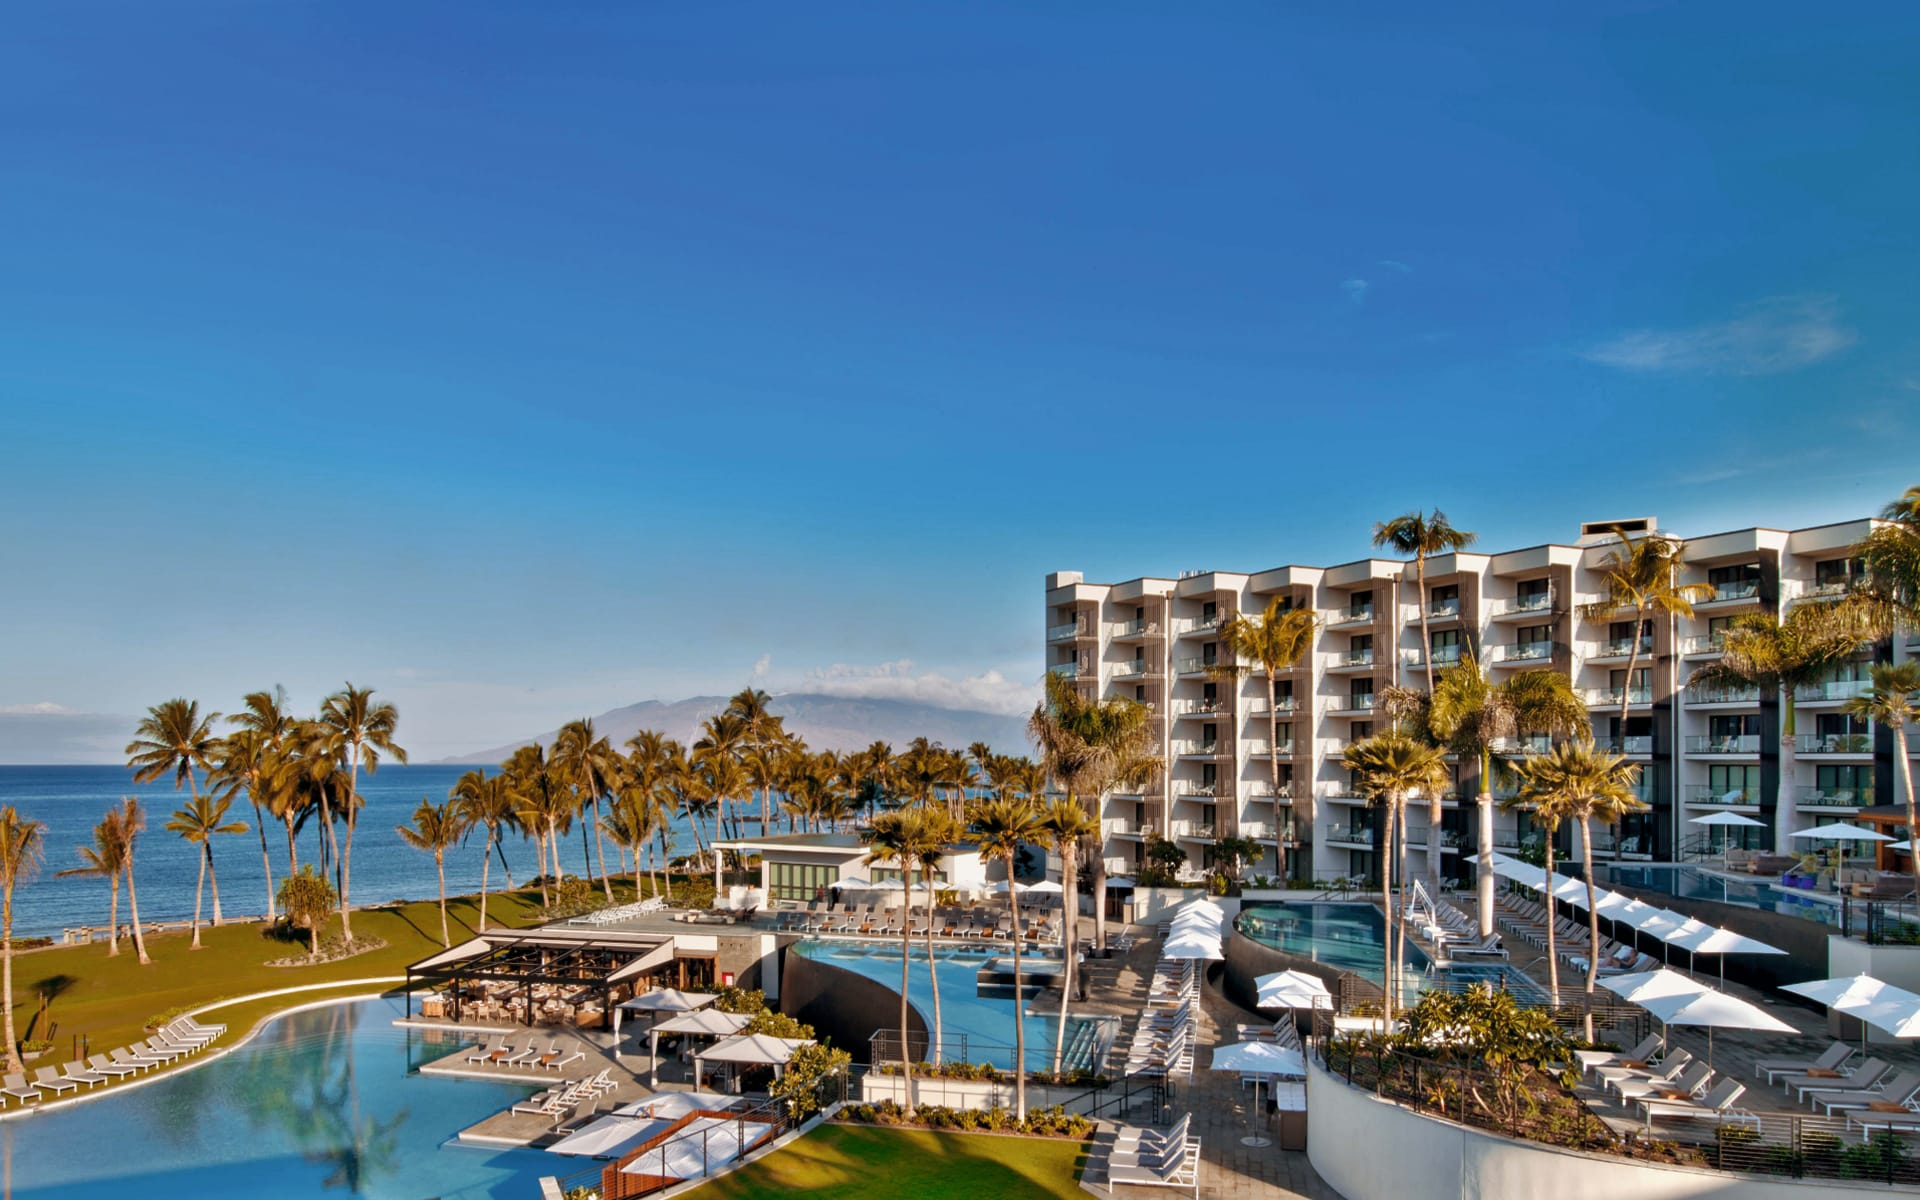 Andaz Maui at Wailea Resort in Wailea - Maui: exterior andaz wailea poolbereich garten hotelgebäude